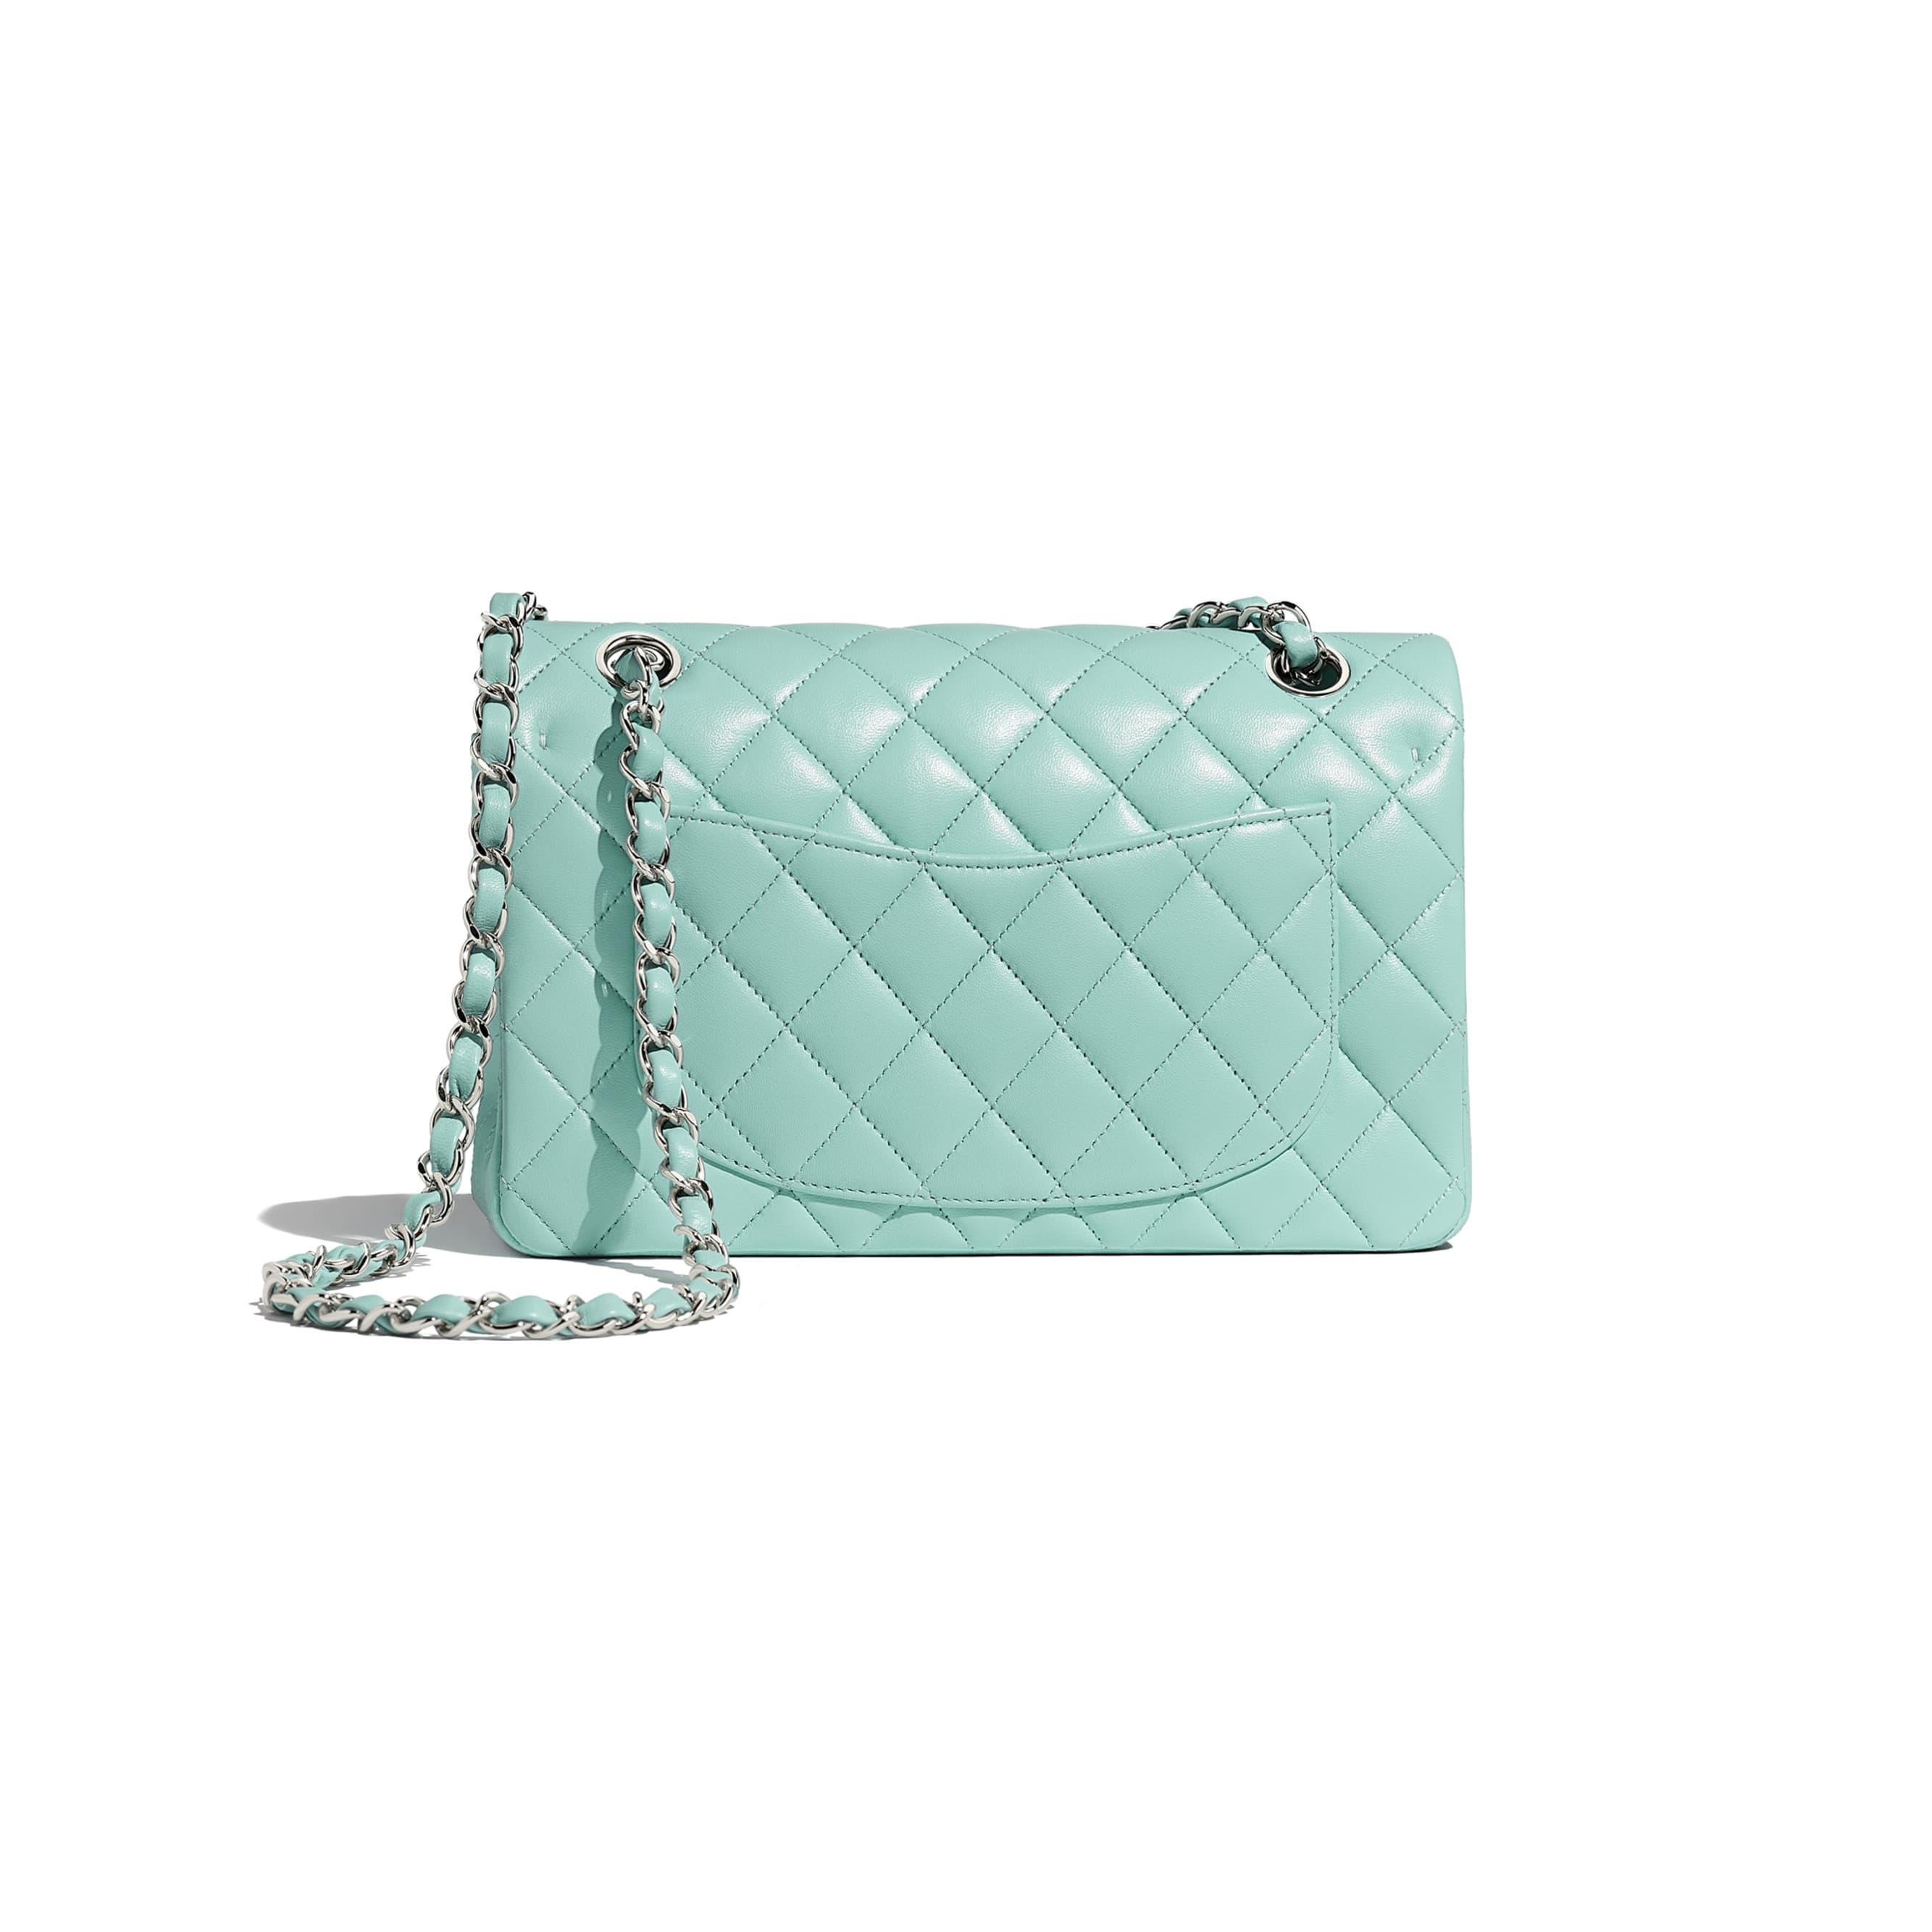 Small Classic Handbag - Light Blue - Lambskin & Silver-Tone Metal - Alternative view - see standard sized version